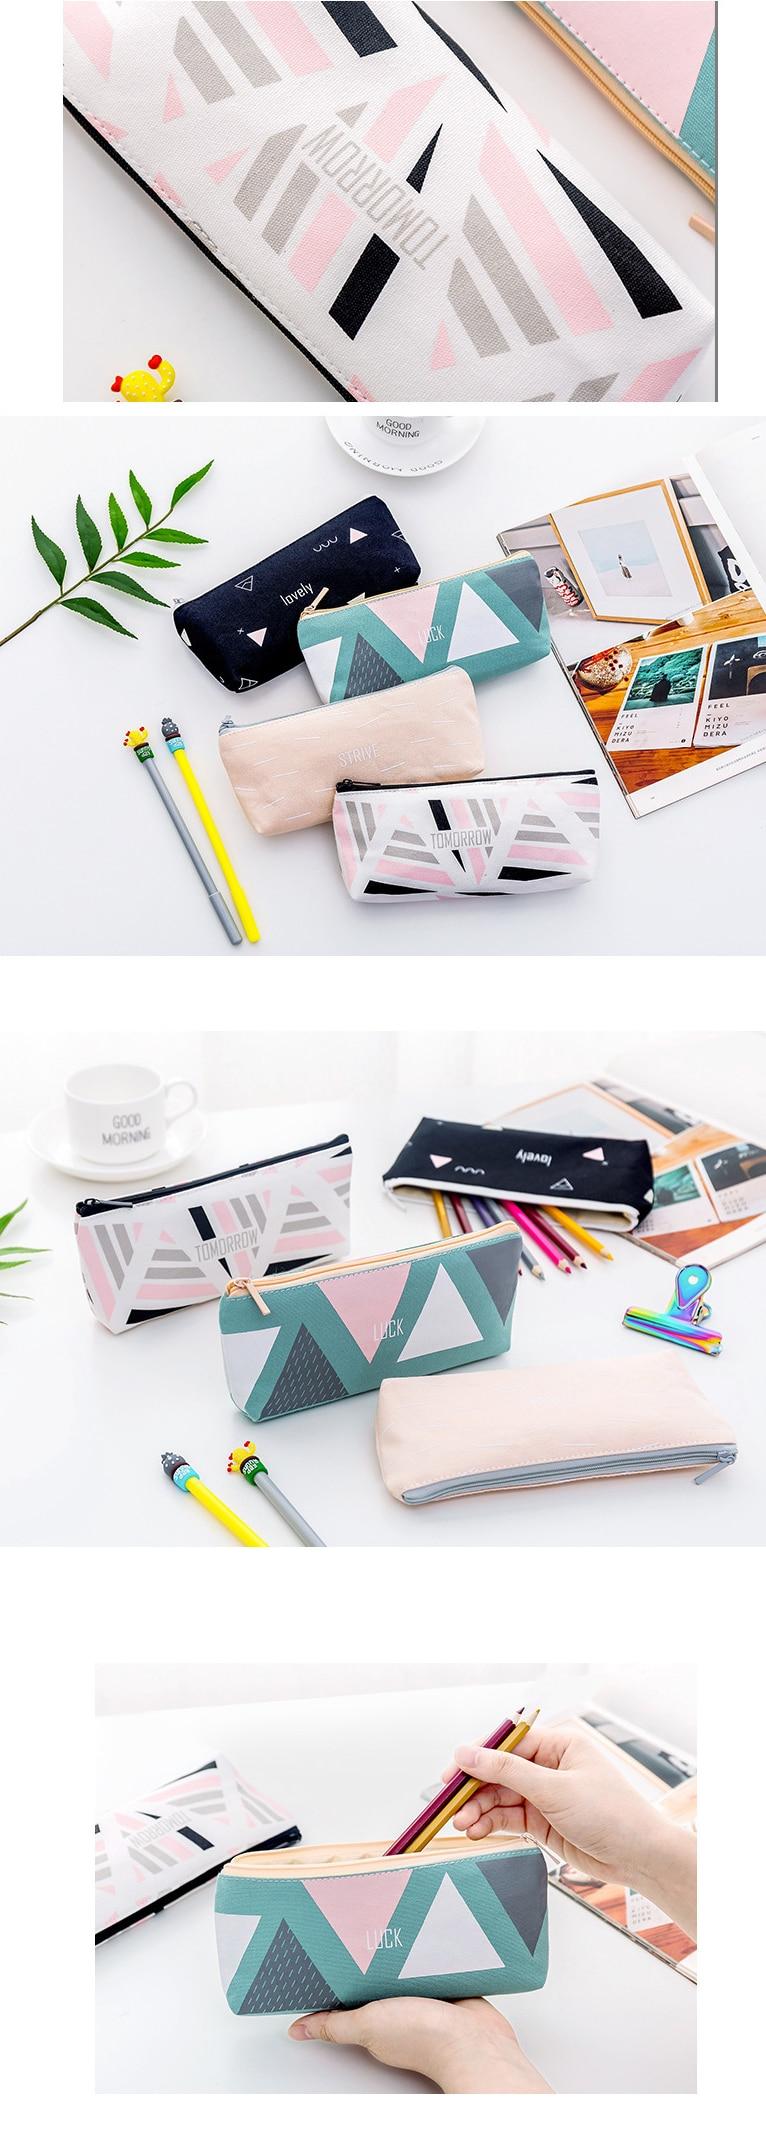 ebb4f917fe61 ᗐCute Fresh Geometric Series Pencil Case Canvas Fashion Triangle ...